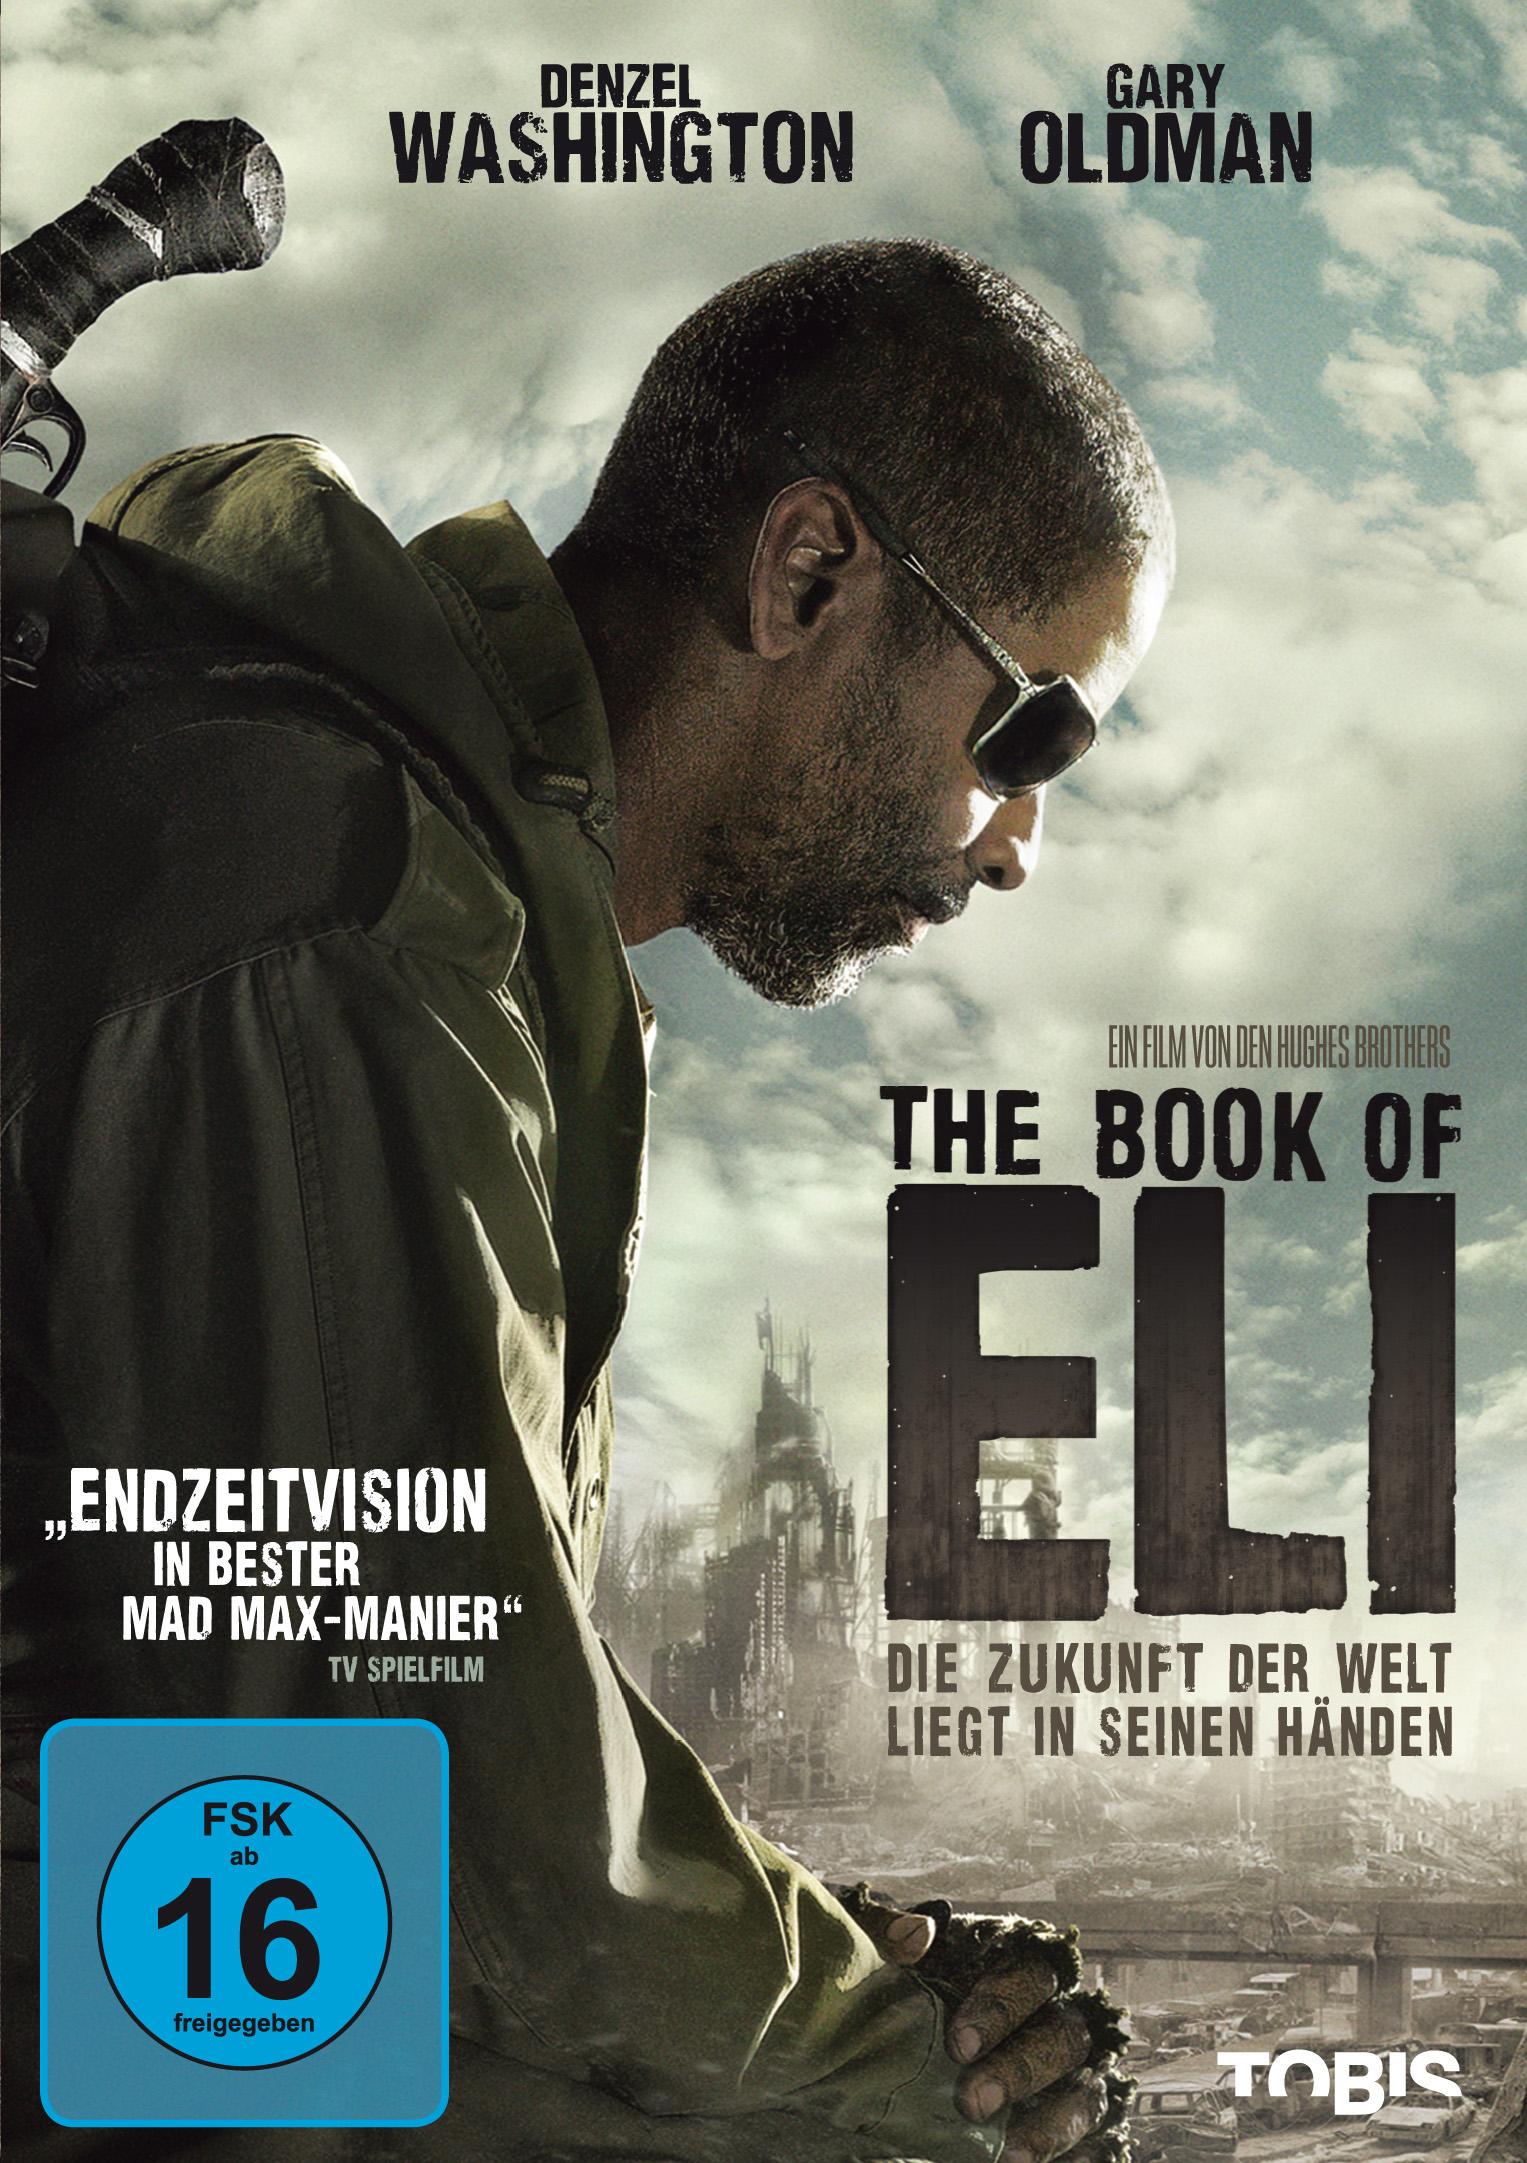 book of eli coursework academic writing service